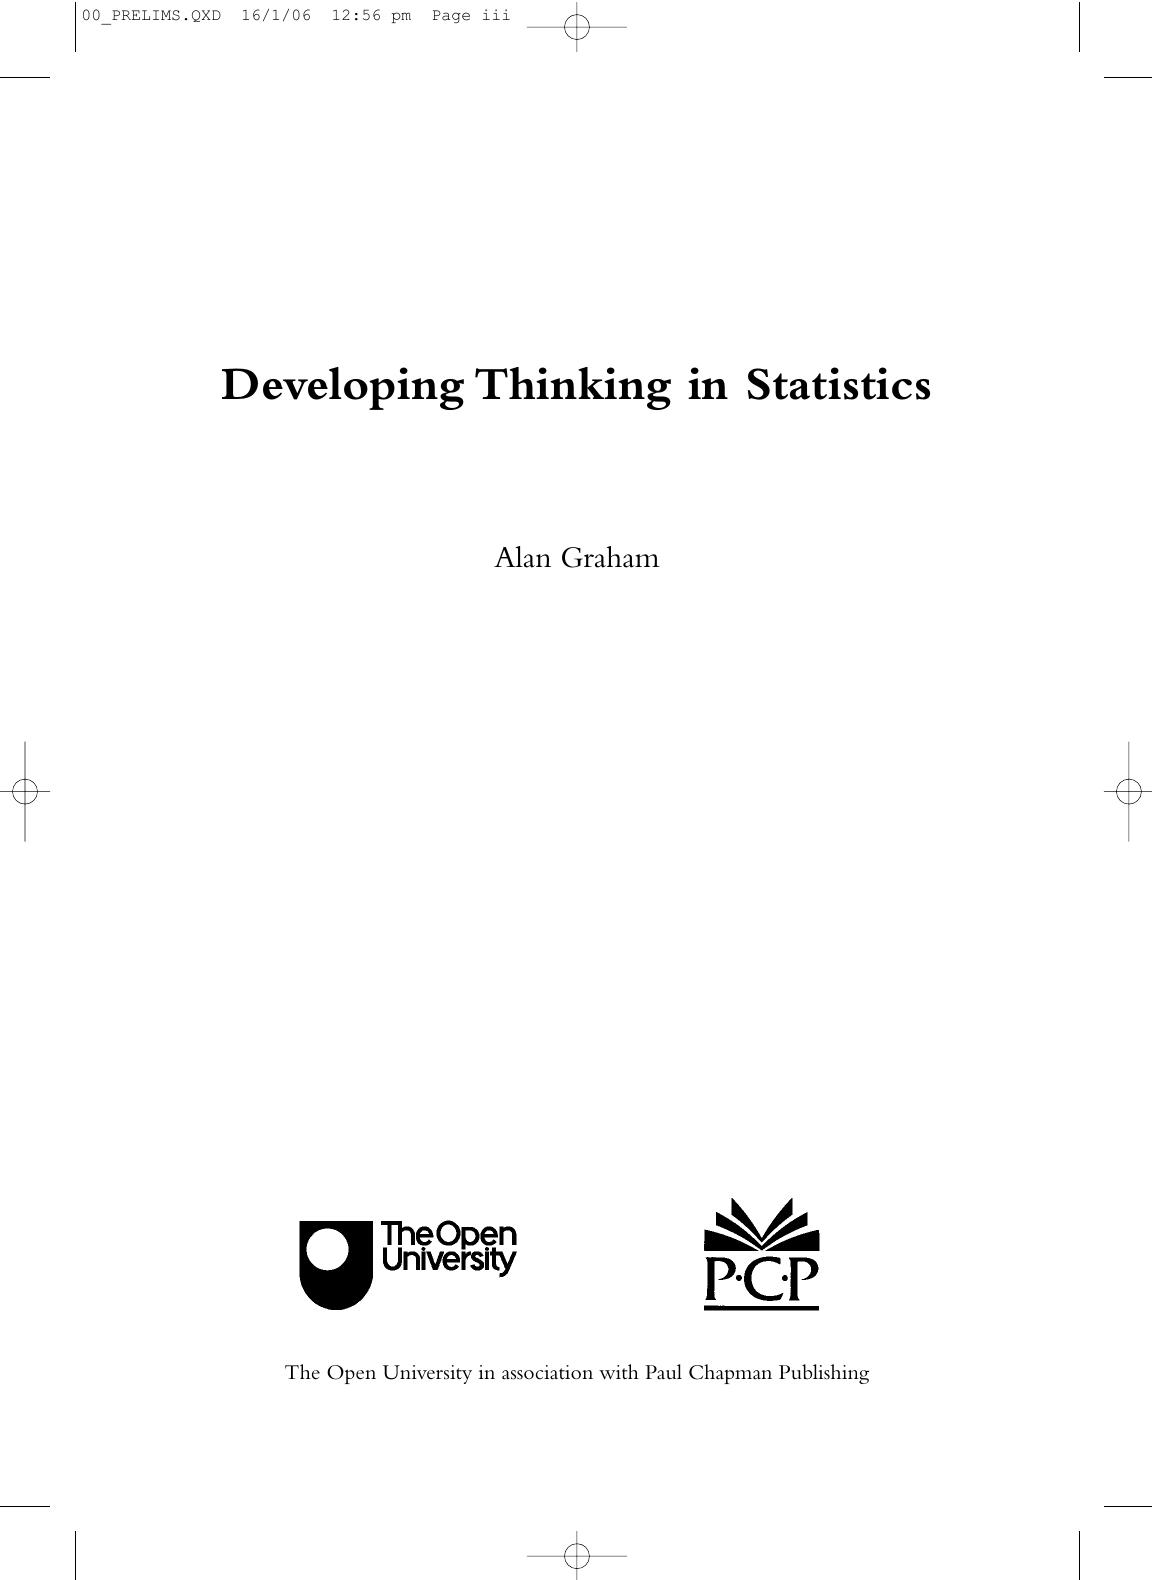 Developing Thinking in Statistics | manualzz.com